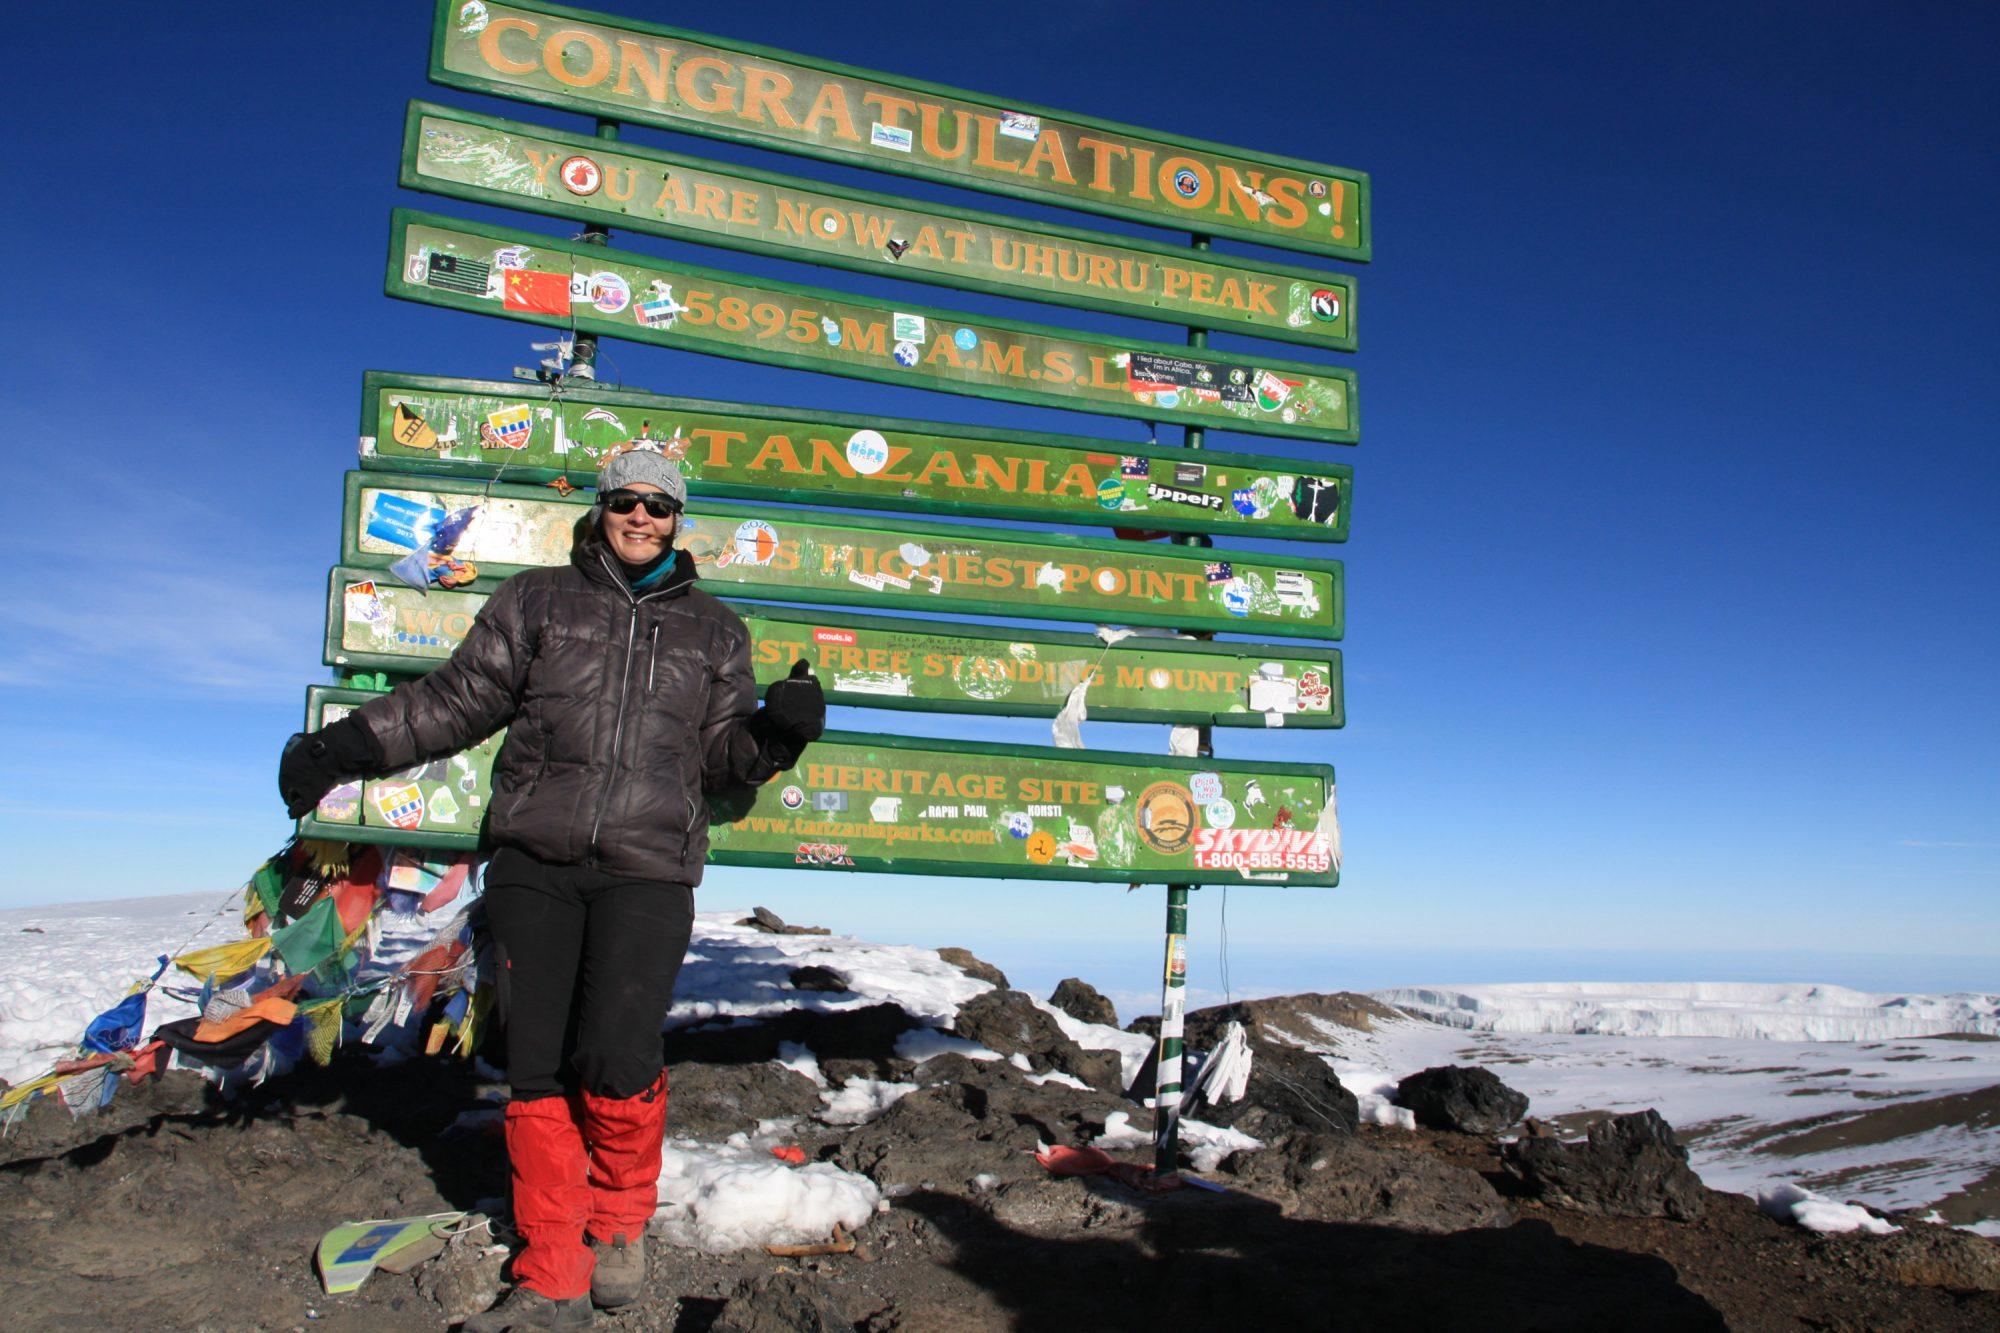 Uhuru Peak, Gipfelfoto, Kilimandscharo, Kilimandscharo besteigen, Tansania, Afrika, Kilimandscharo Tour, Erfahrungsbericht, Machame Route